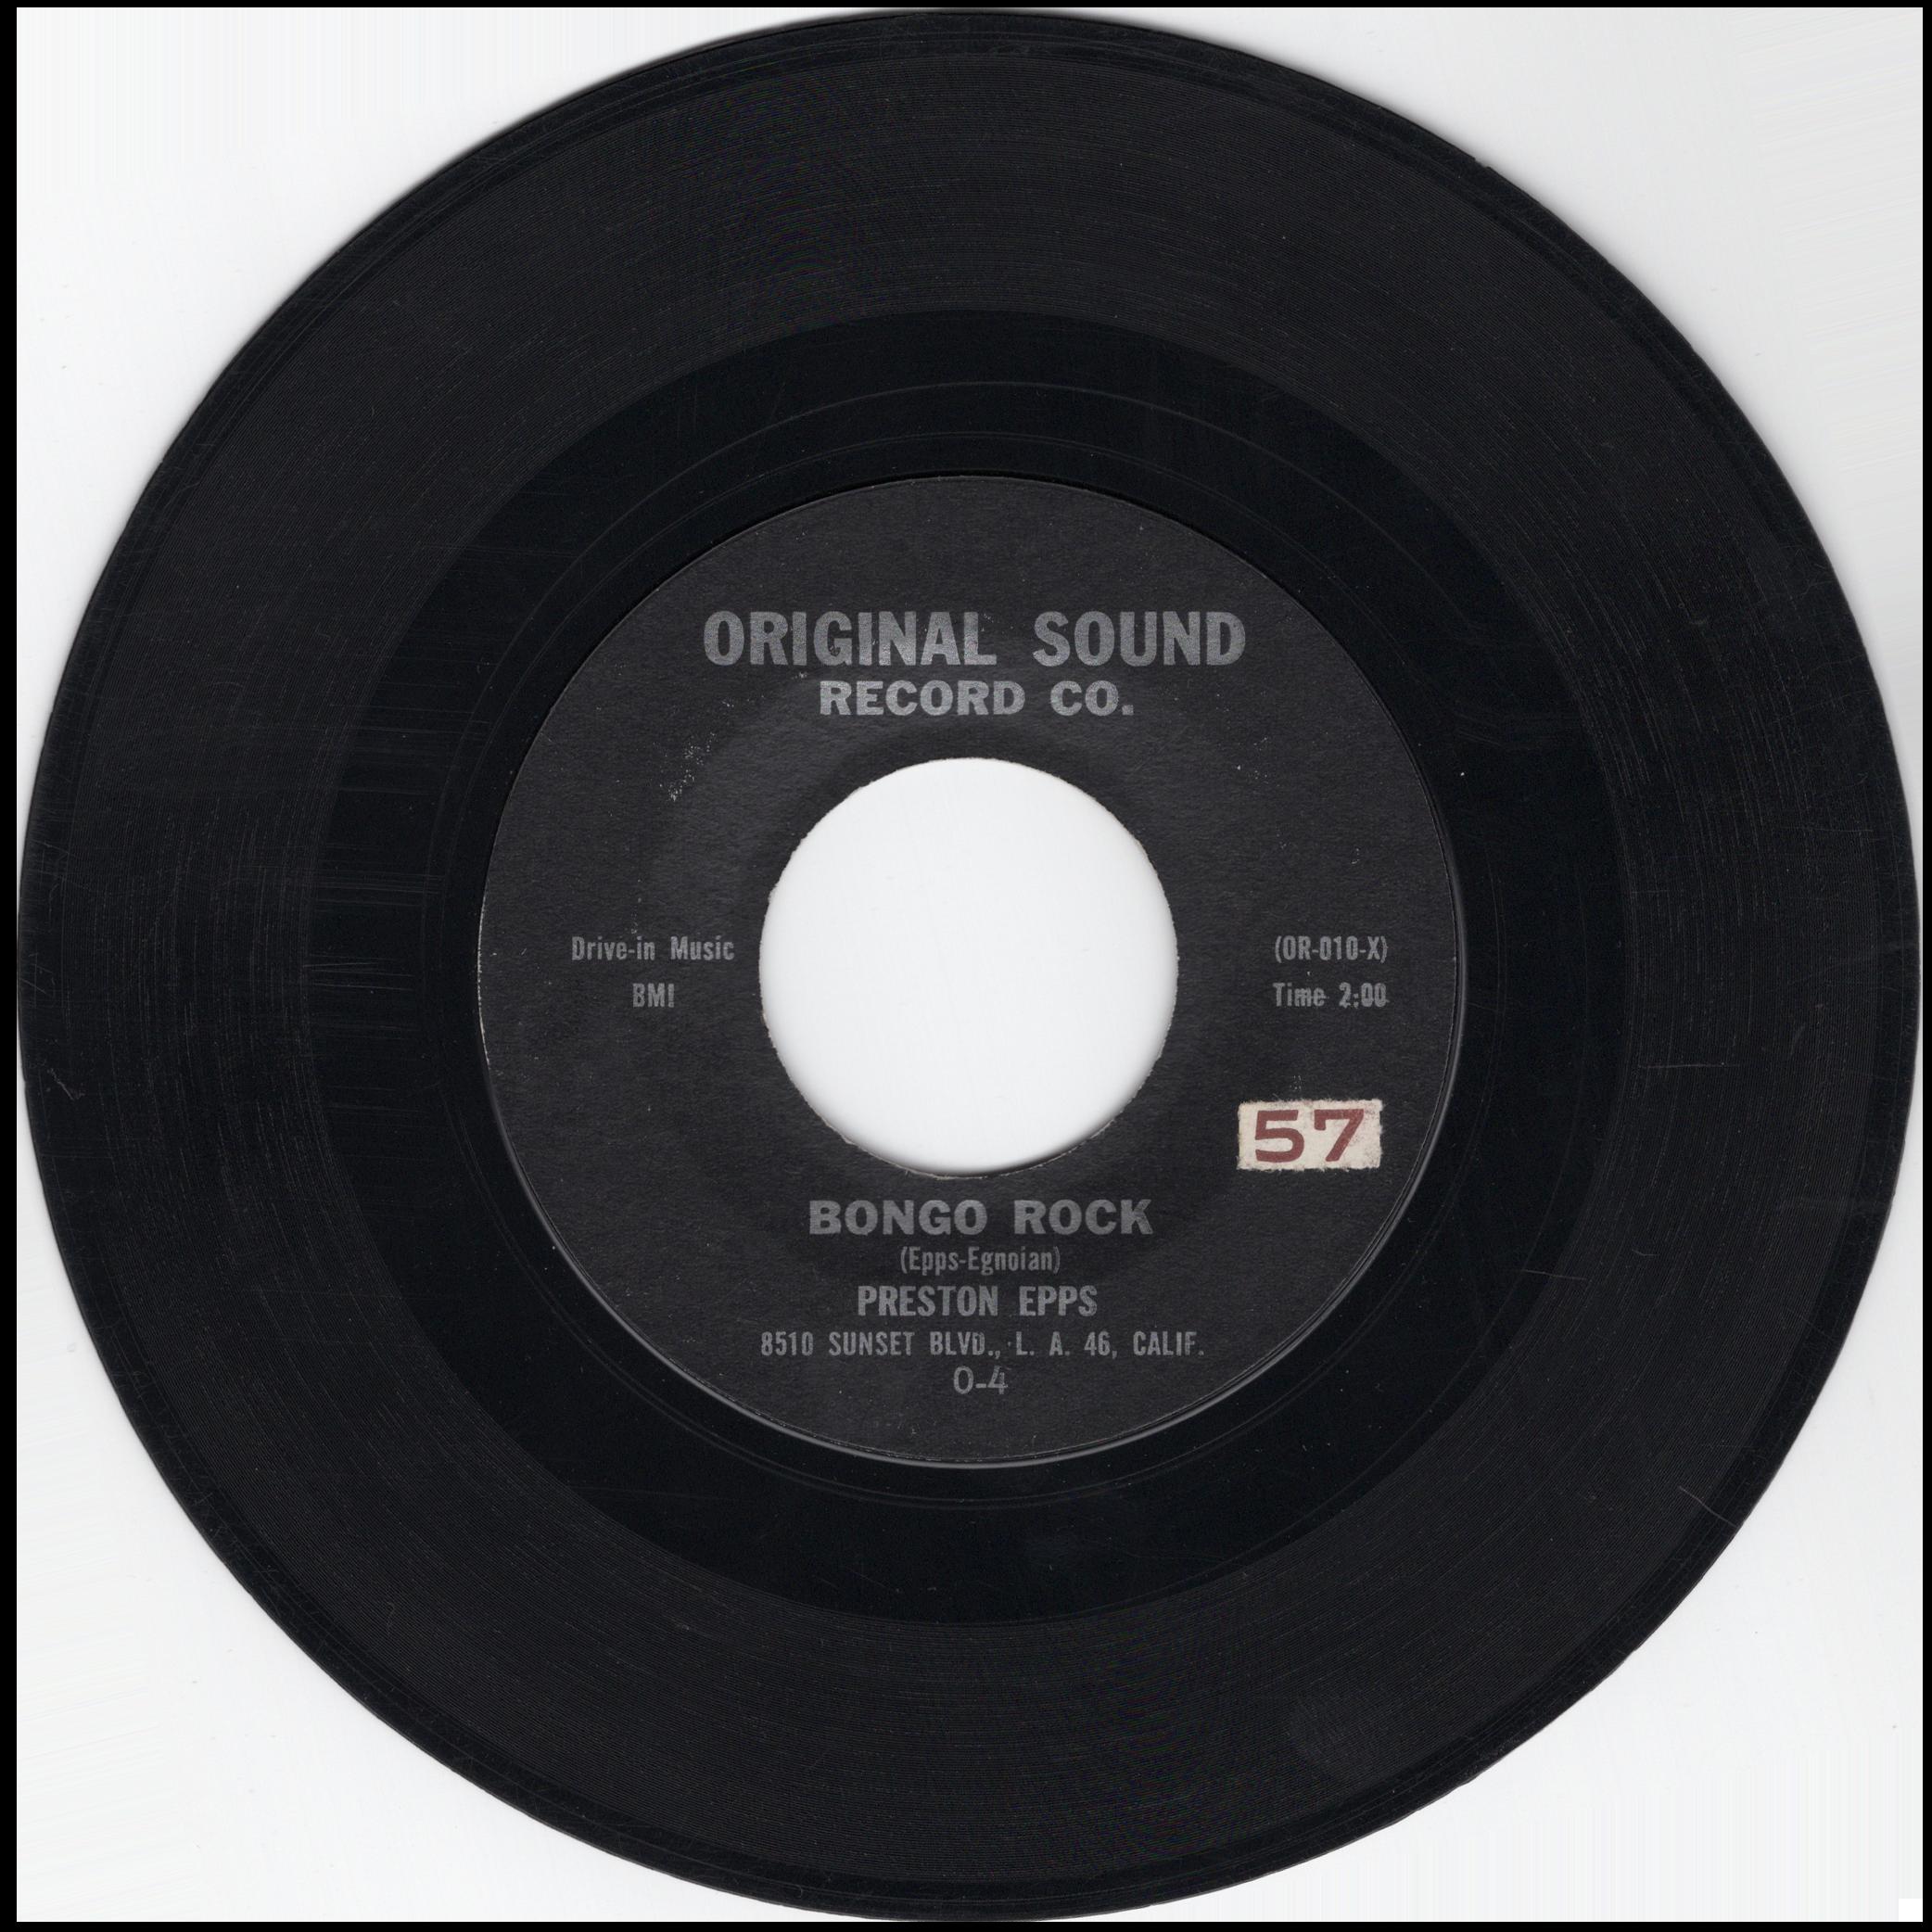 WLWLTDOO-1959-45-PRESTON_EPPS-BONGO_ROCK-O4.png